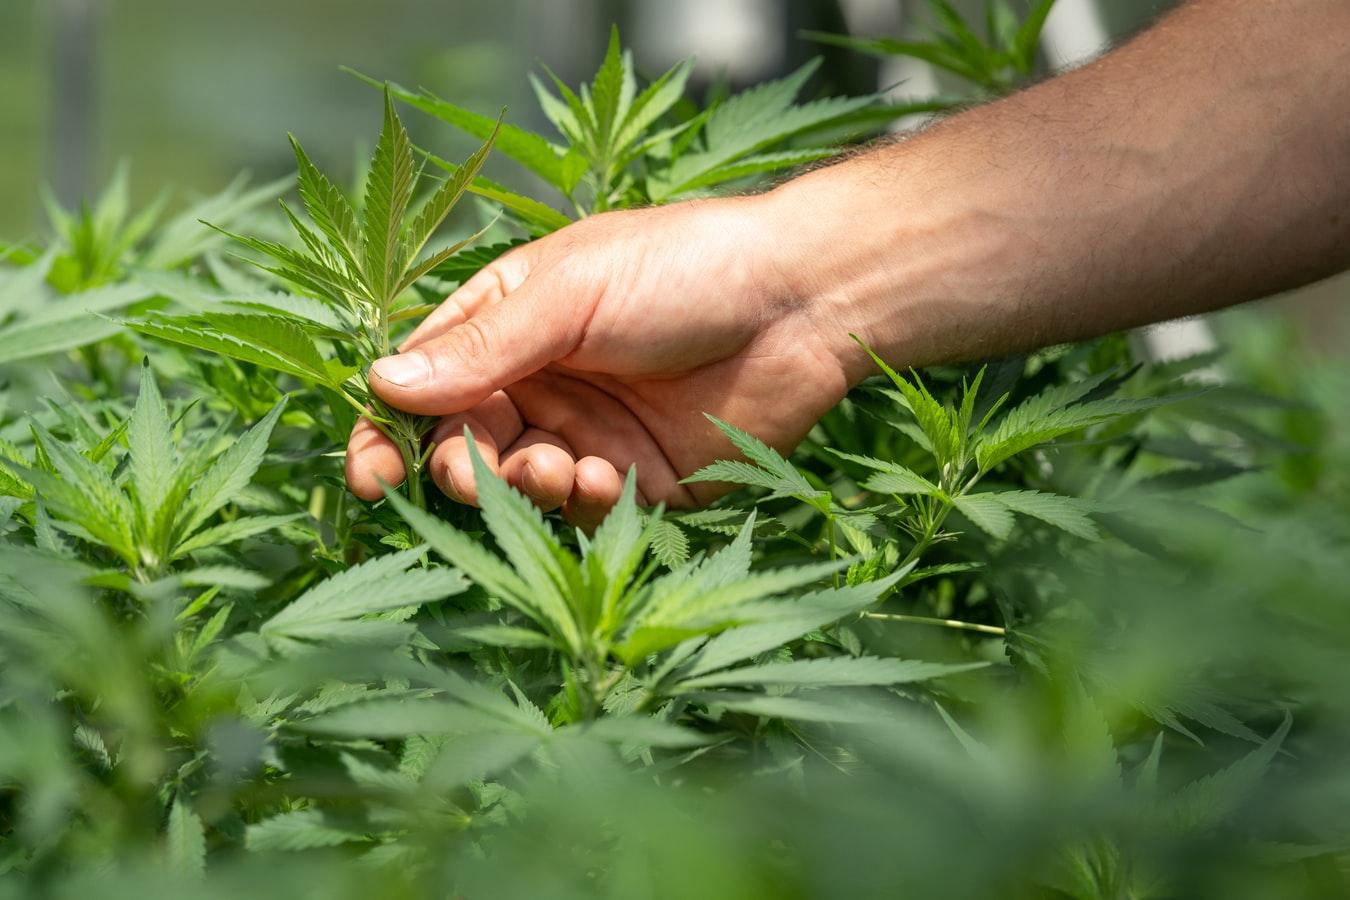 Marijuana Reform Bill